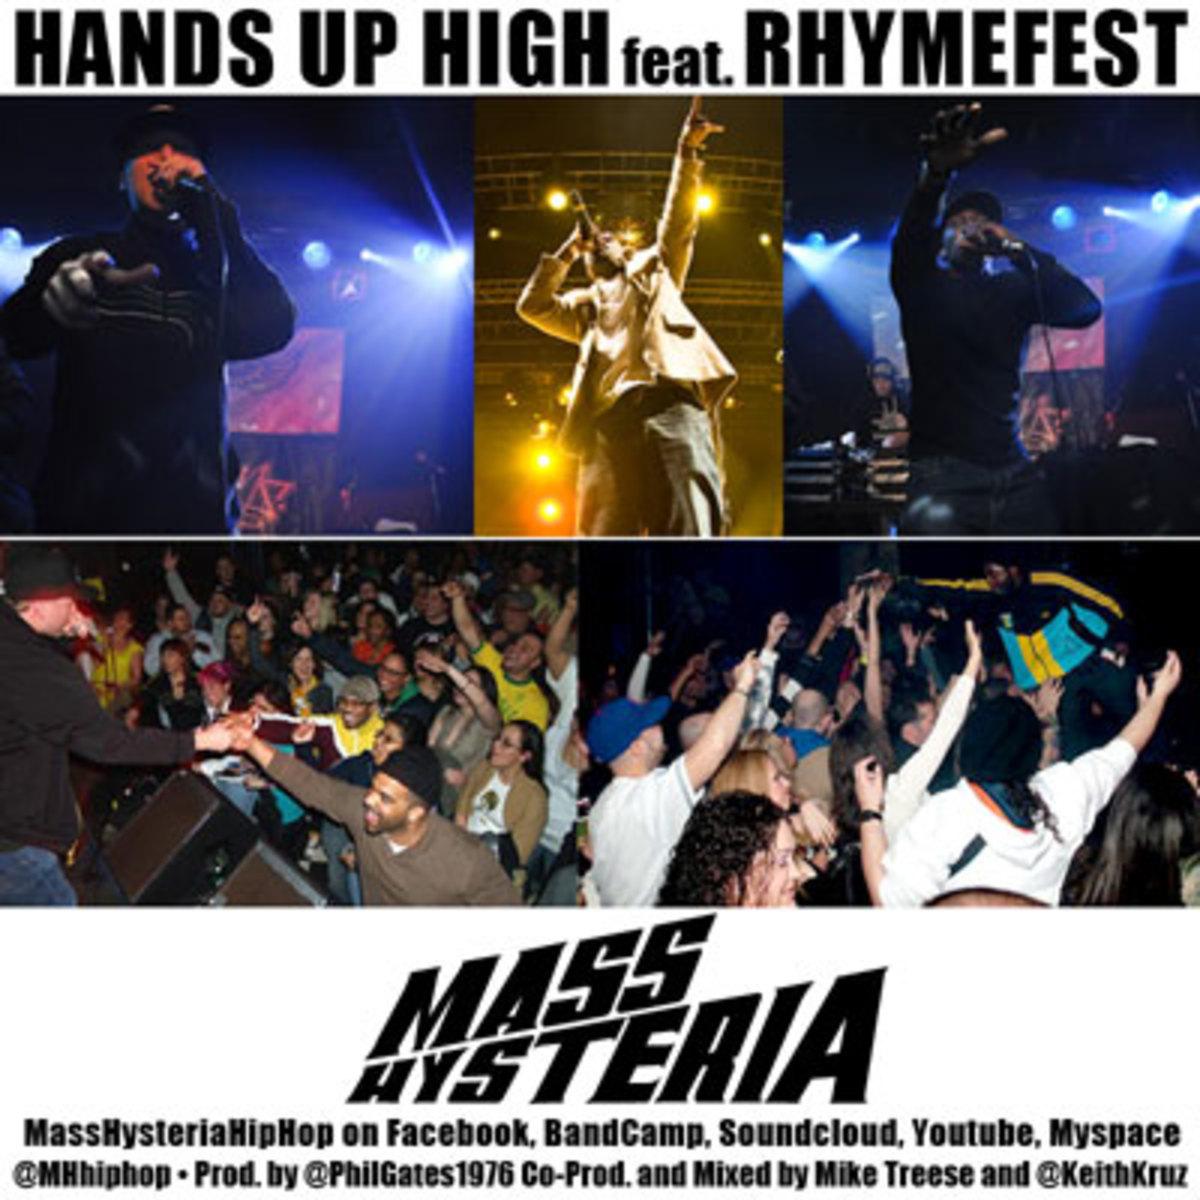 masshysteria-handsuphigh.jpg